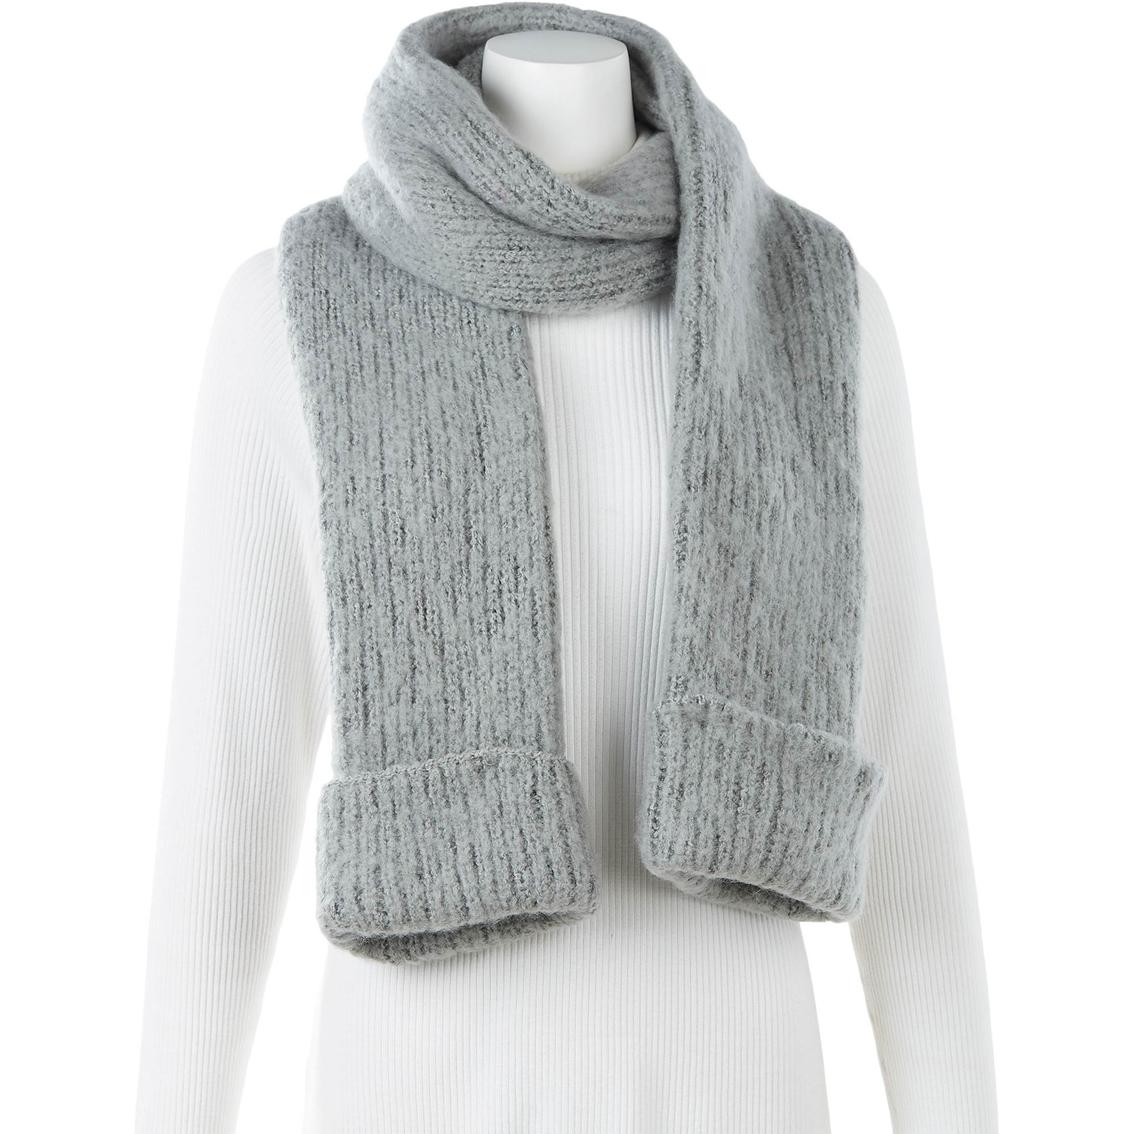 New York Accessory Cuffed Winter Scarf | Scarves & Gloves | Handbags ...